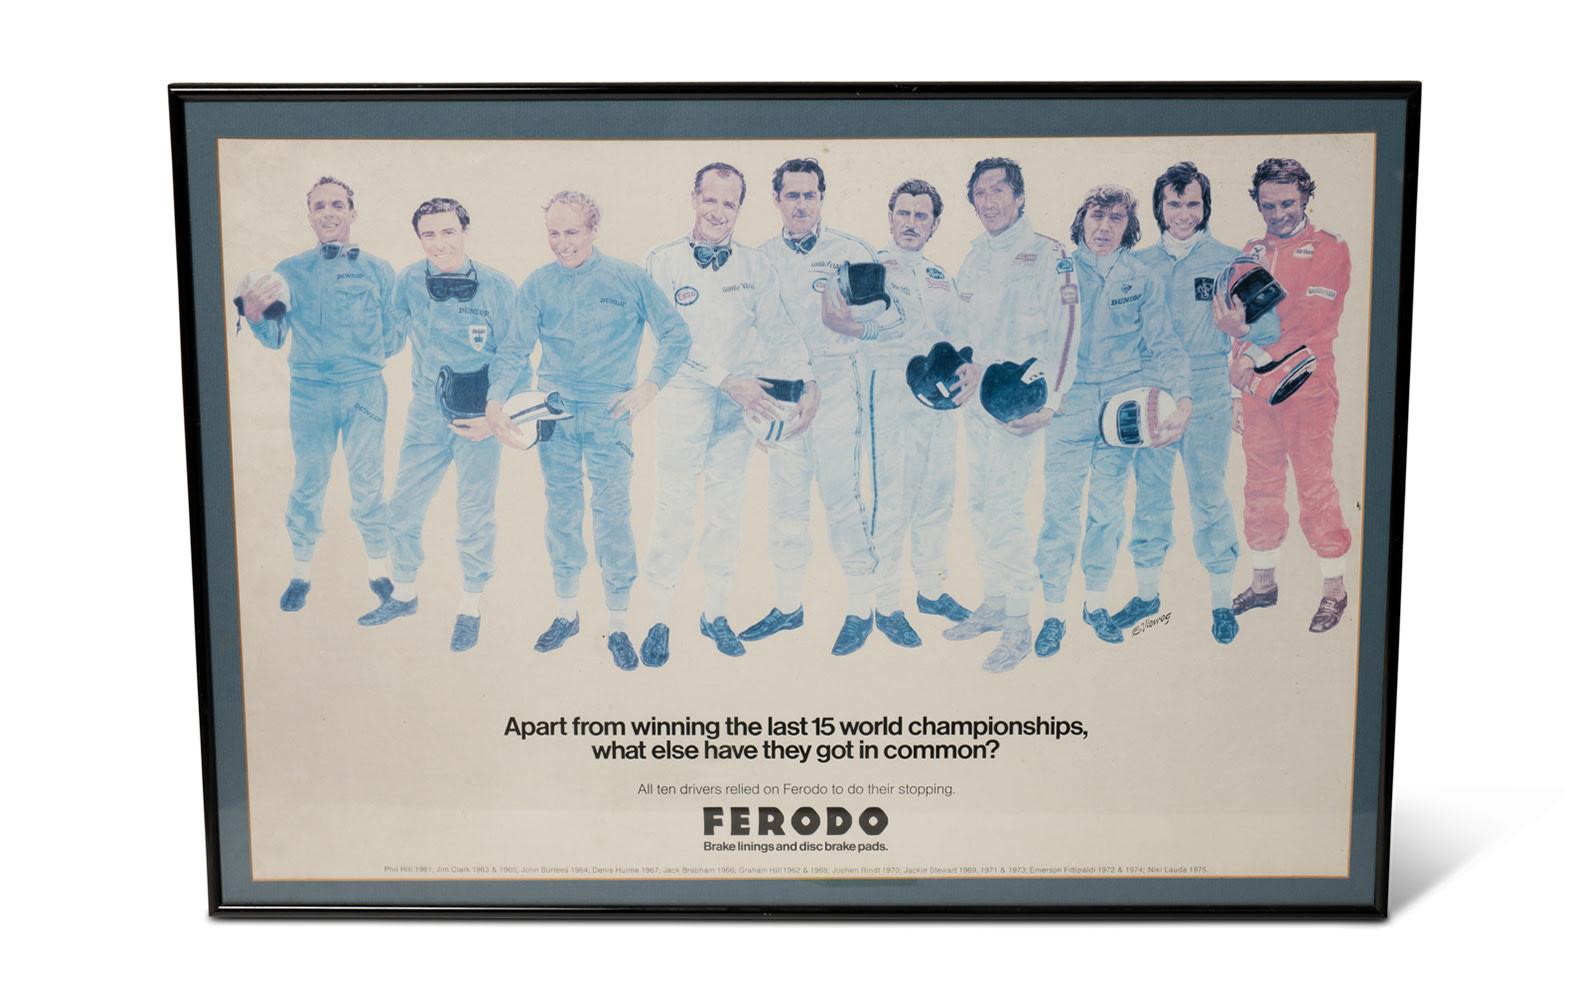 Prod/O21E - Phil Hill C 2021/C0037_Ferodo Poster, Framed/C0037_Ferodo_Poster_1_jgny3y